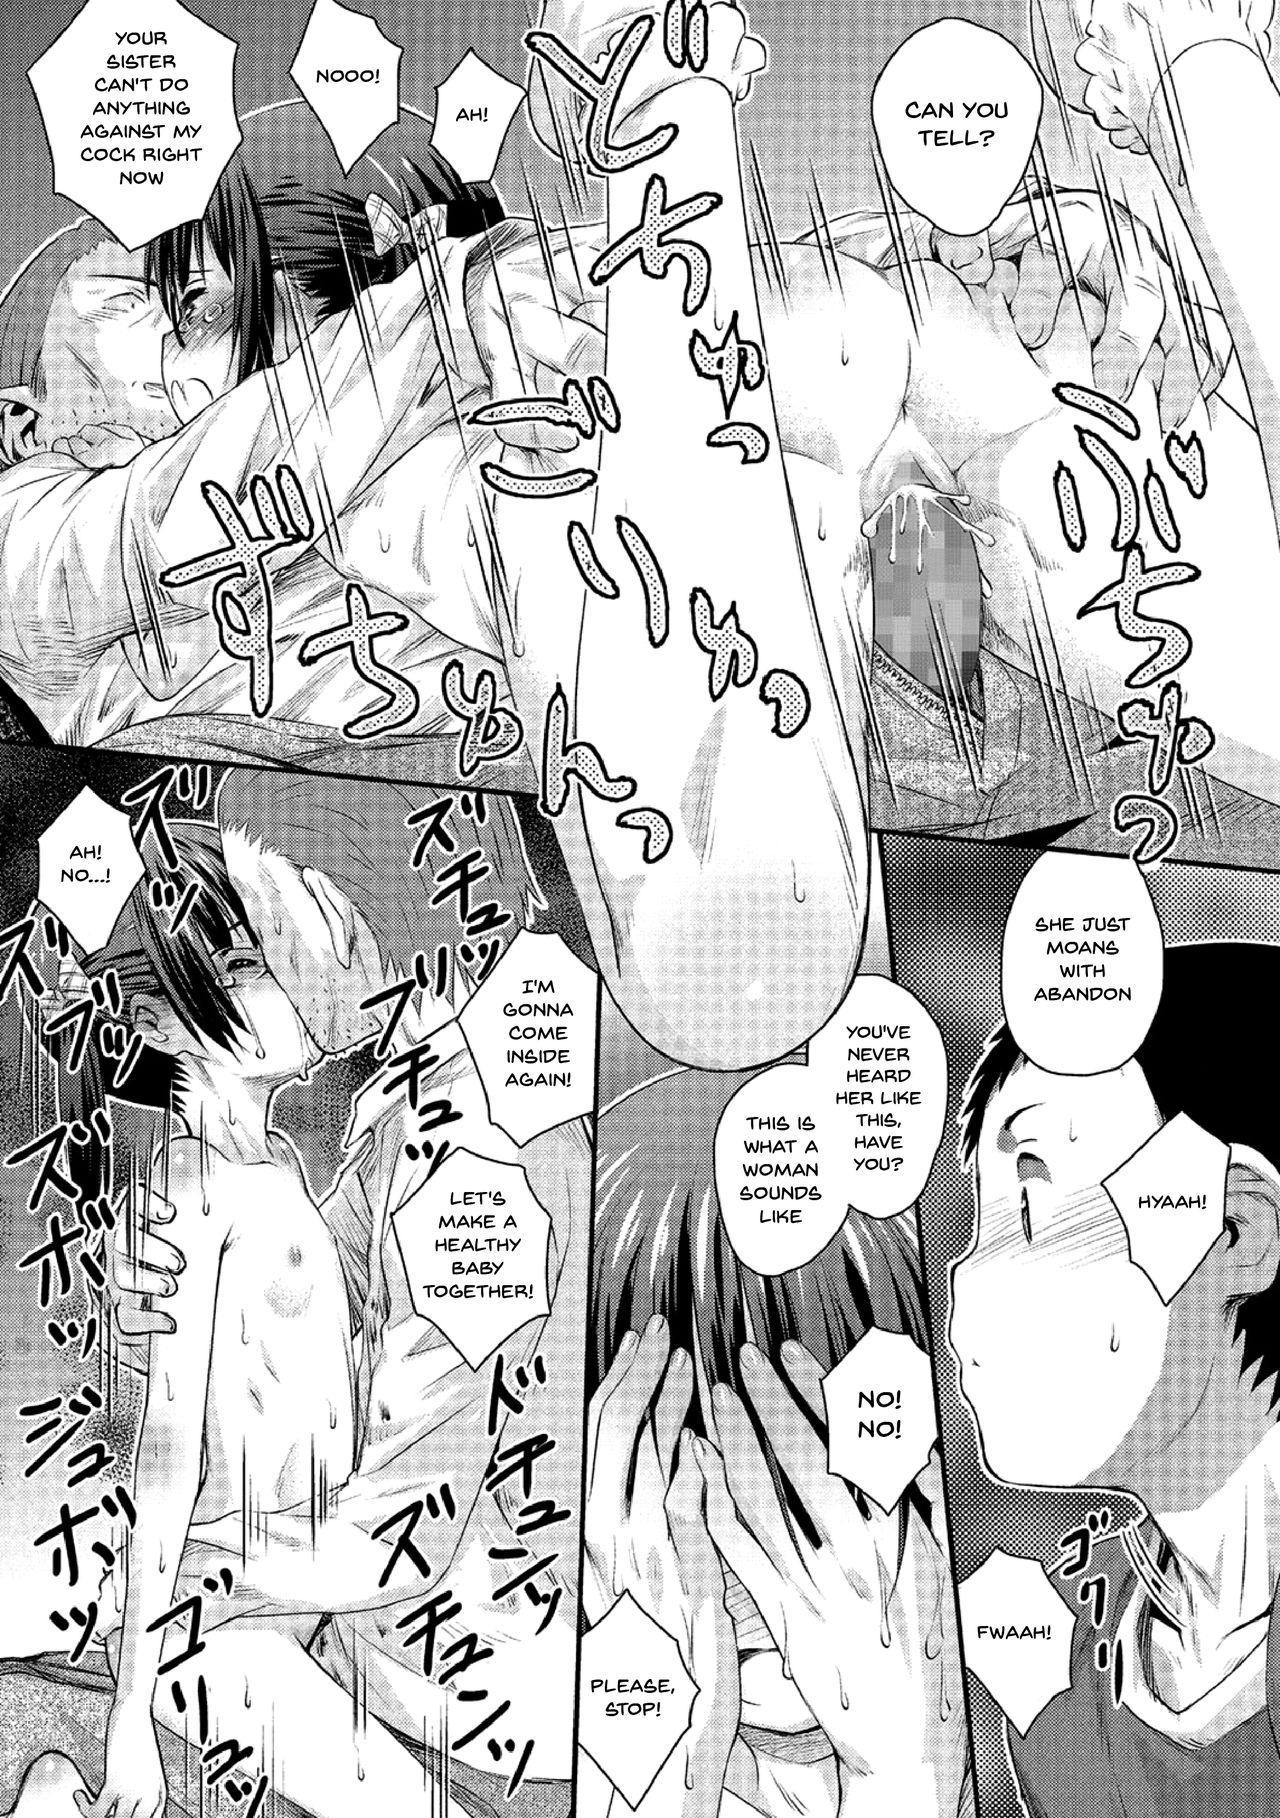 [Anthology] Megane Loli Choukyou Jugyou!! ~Otonashii Megane Lolikko ni Muriyari Dekachin Sounyuu~   The Loli In Glasses' Training Lesson!! ~Force Fucking a Timid Glasses Wearing Loli With My Big Cock~ Ch. 1-3 [English] {Doujins.com} 30